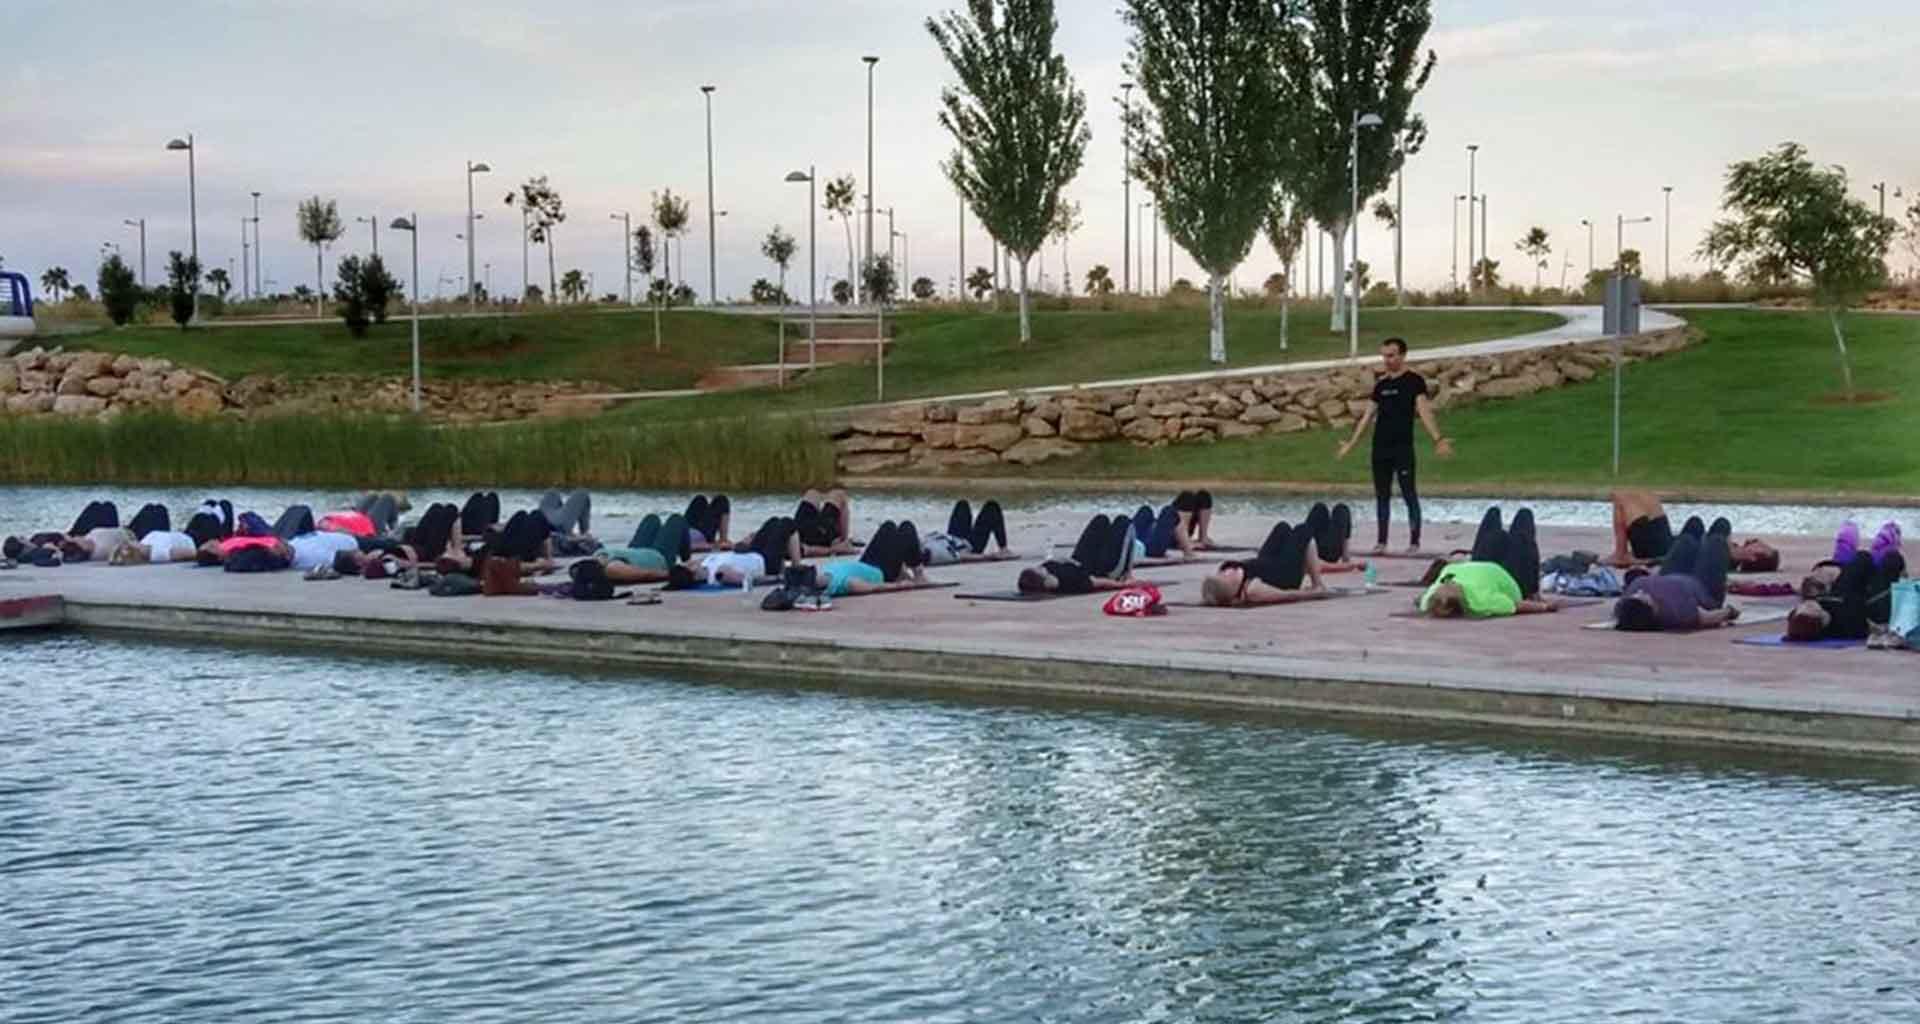 01 - Evento Yoga 2019 lago de la vida Dos Hermanas apoyo al programa angeles - Yoga 21